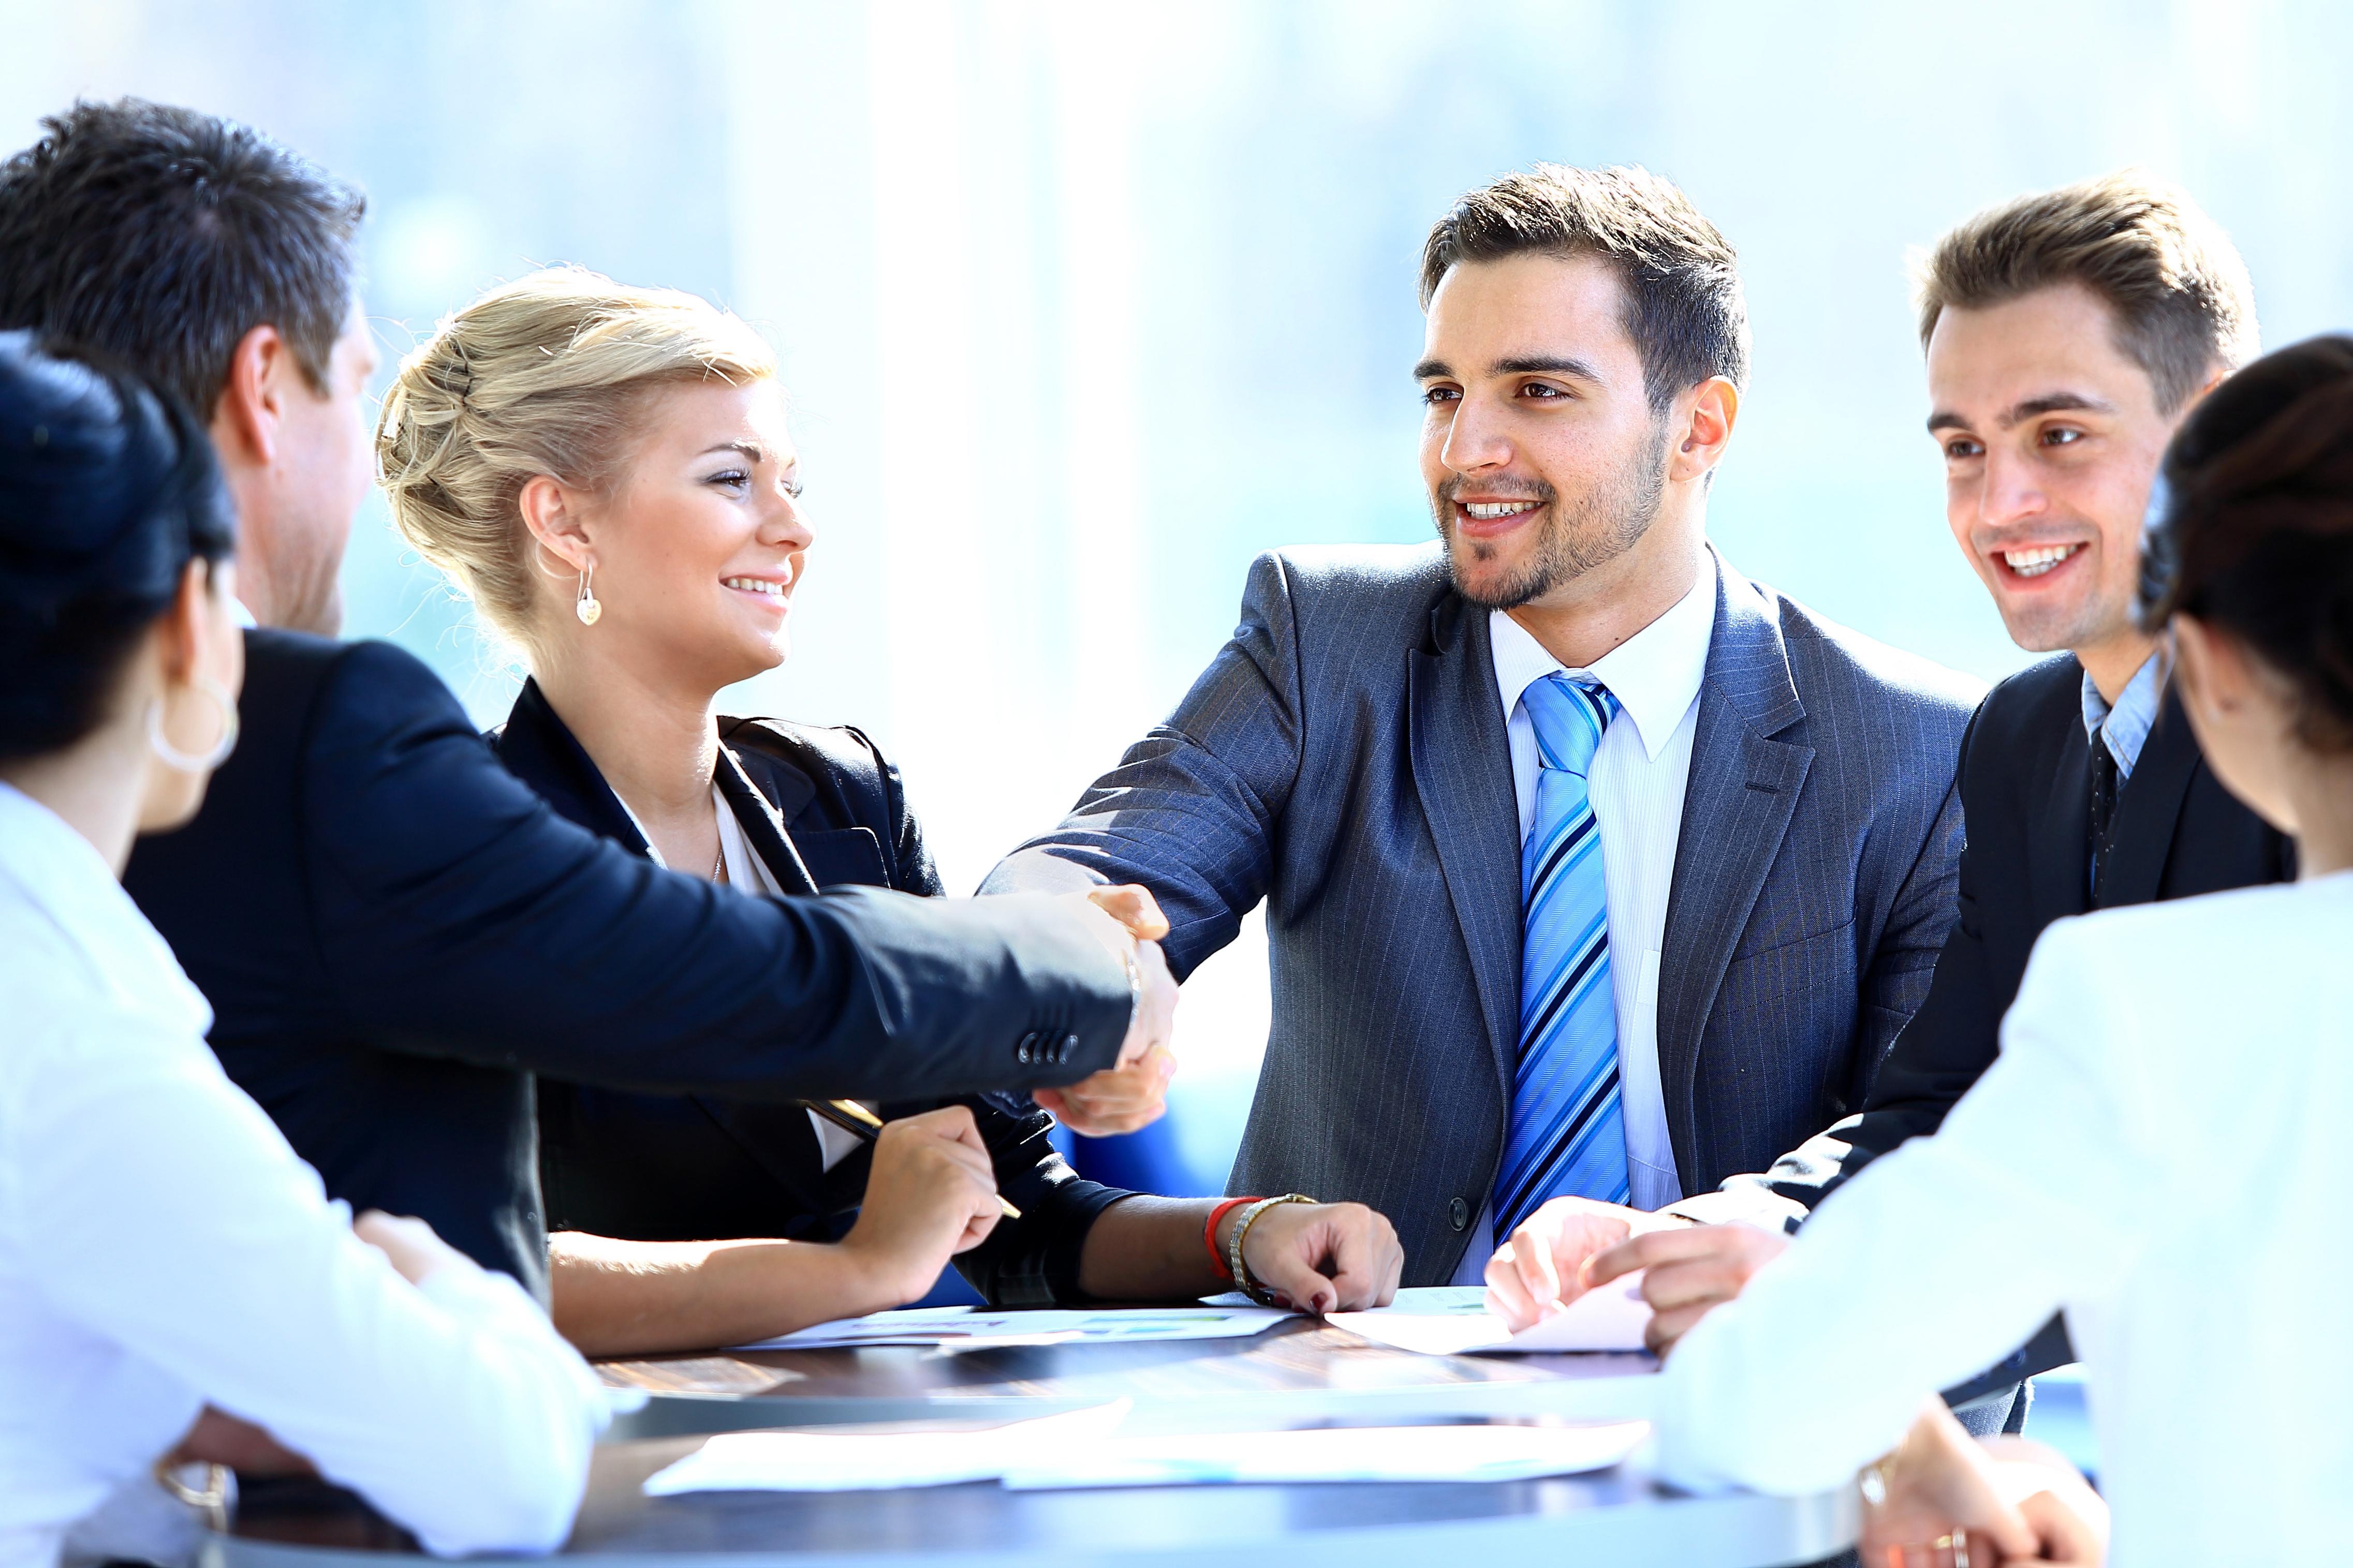 Daytona Beach business plan lawyer